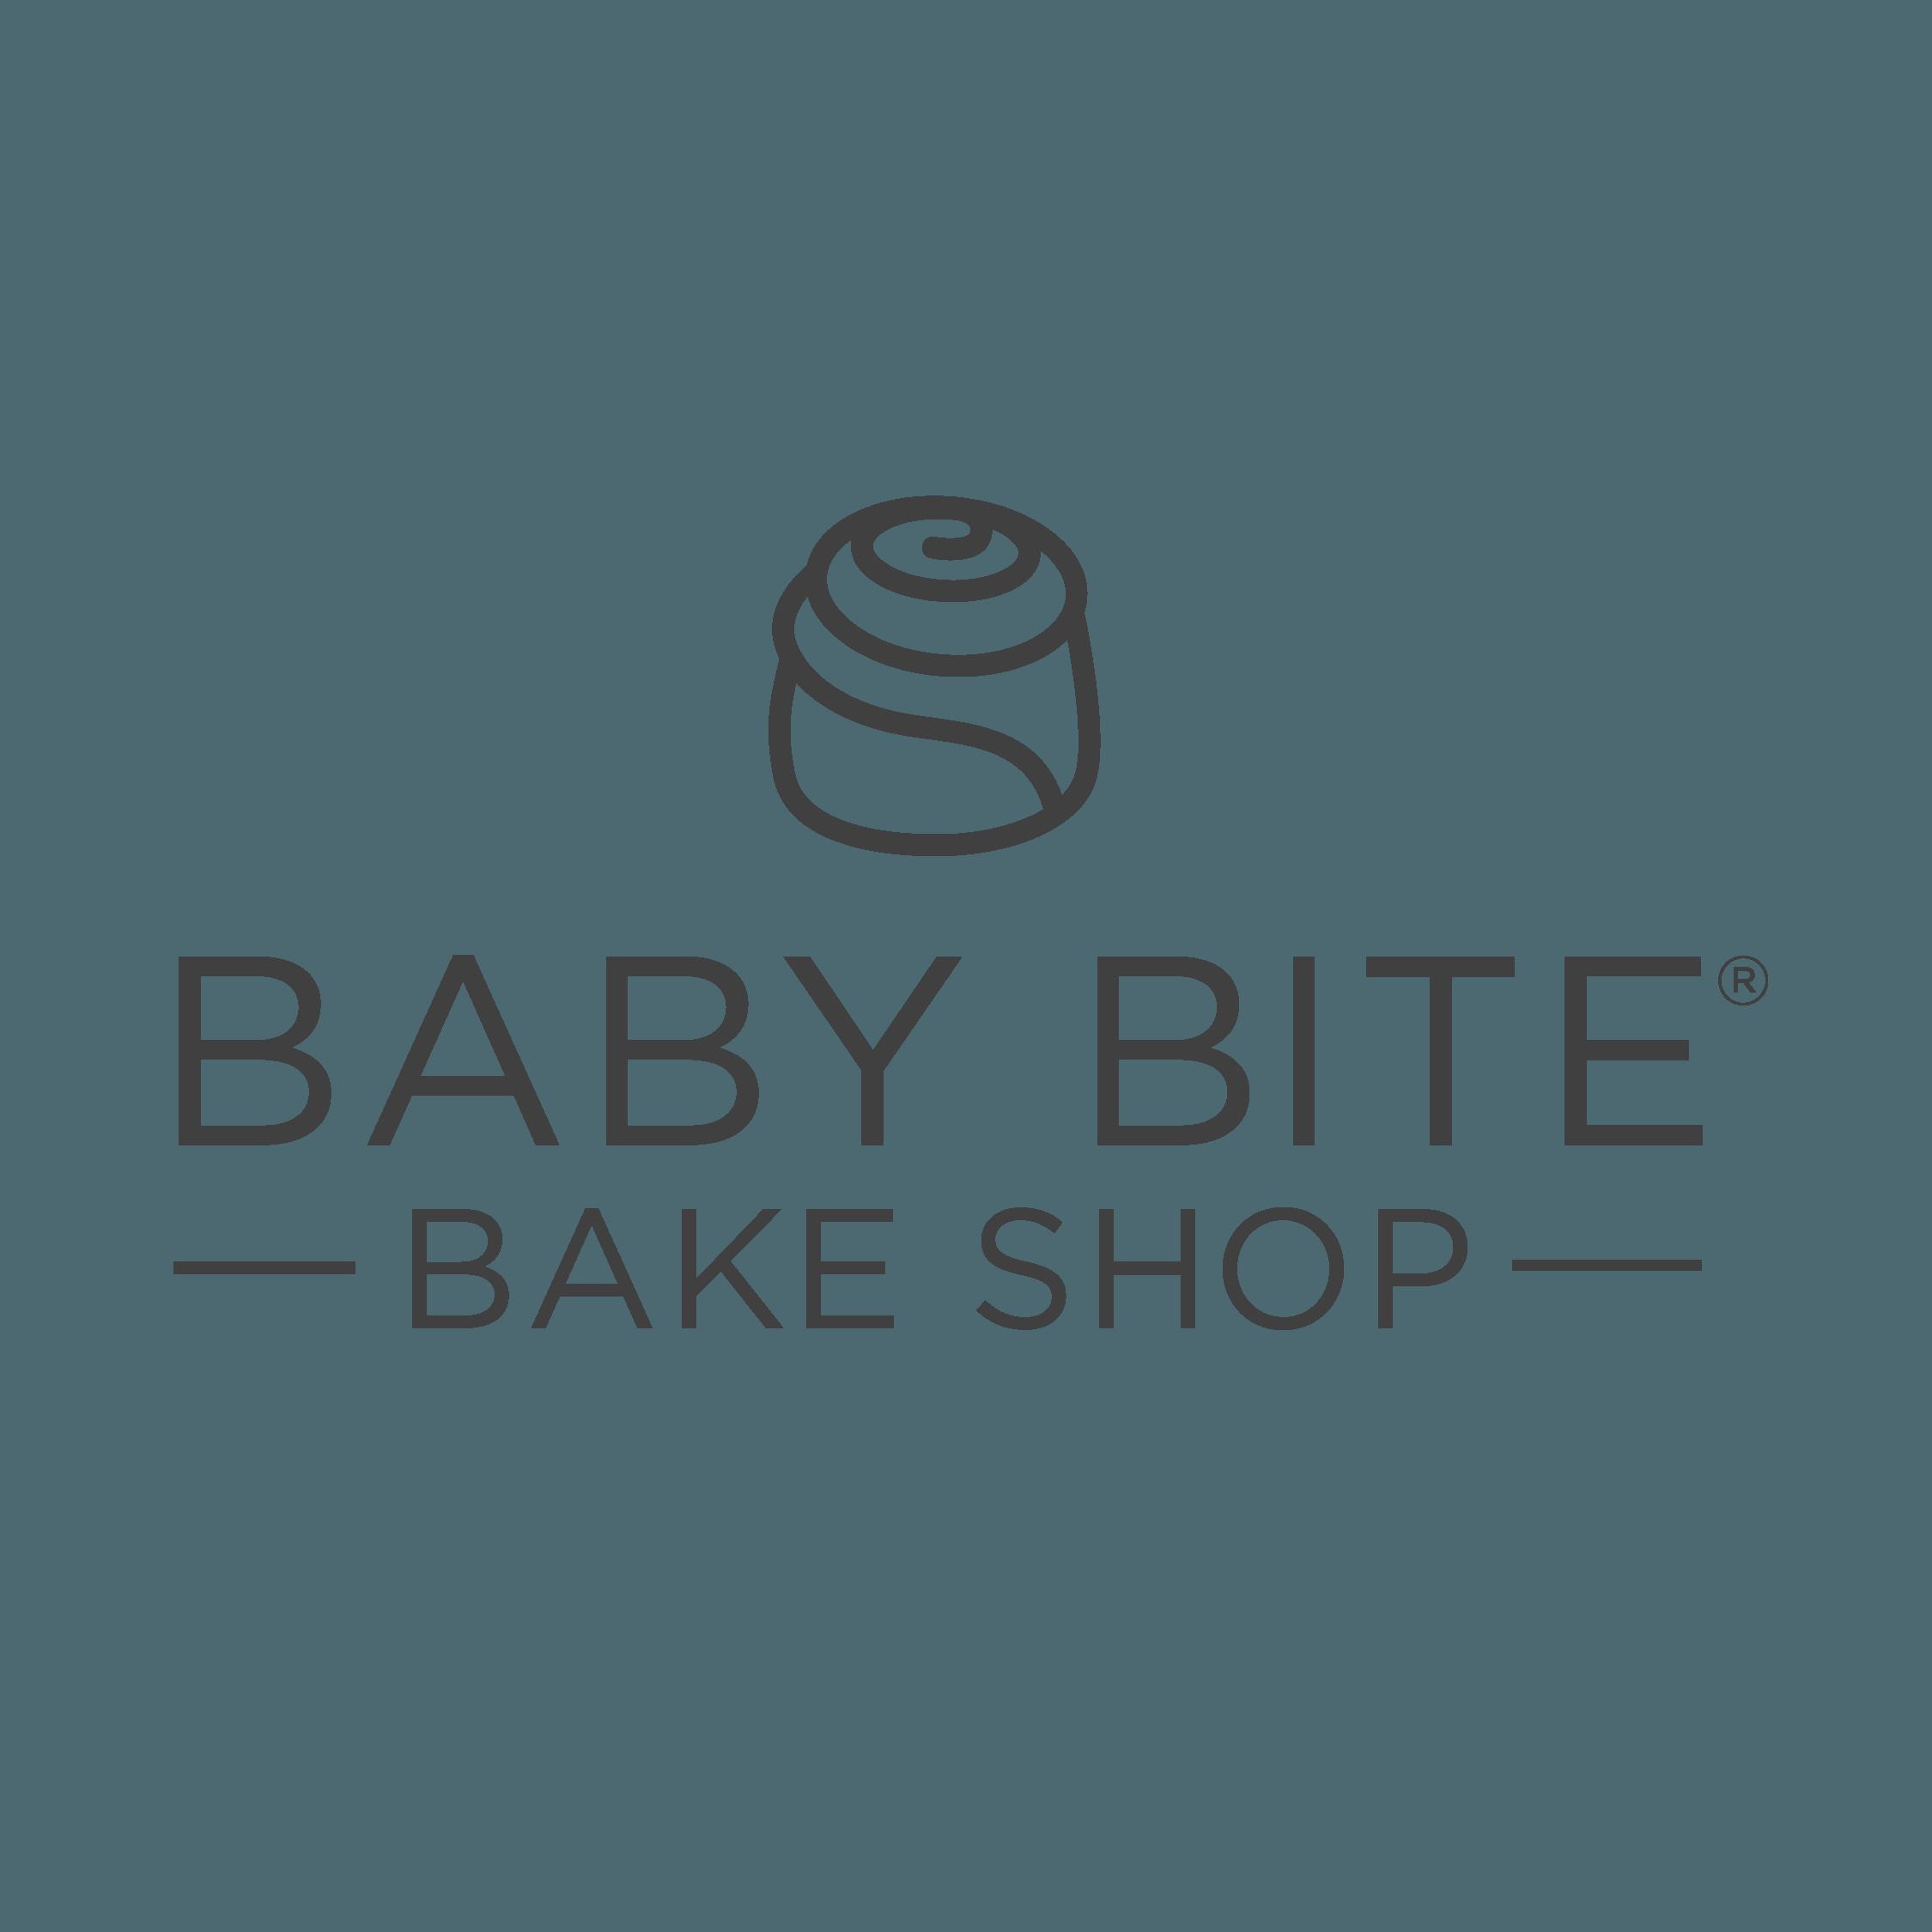 Baby Bite Bake Shop Logo